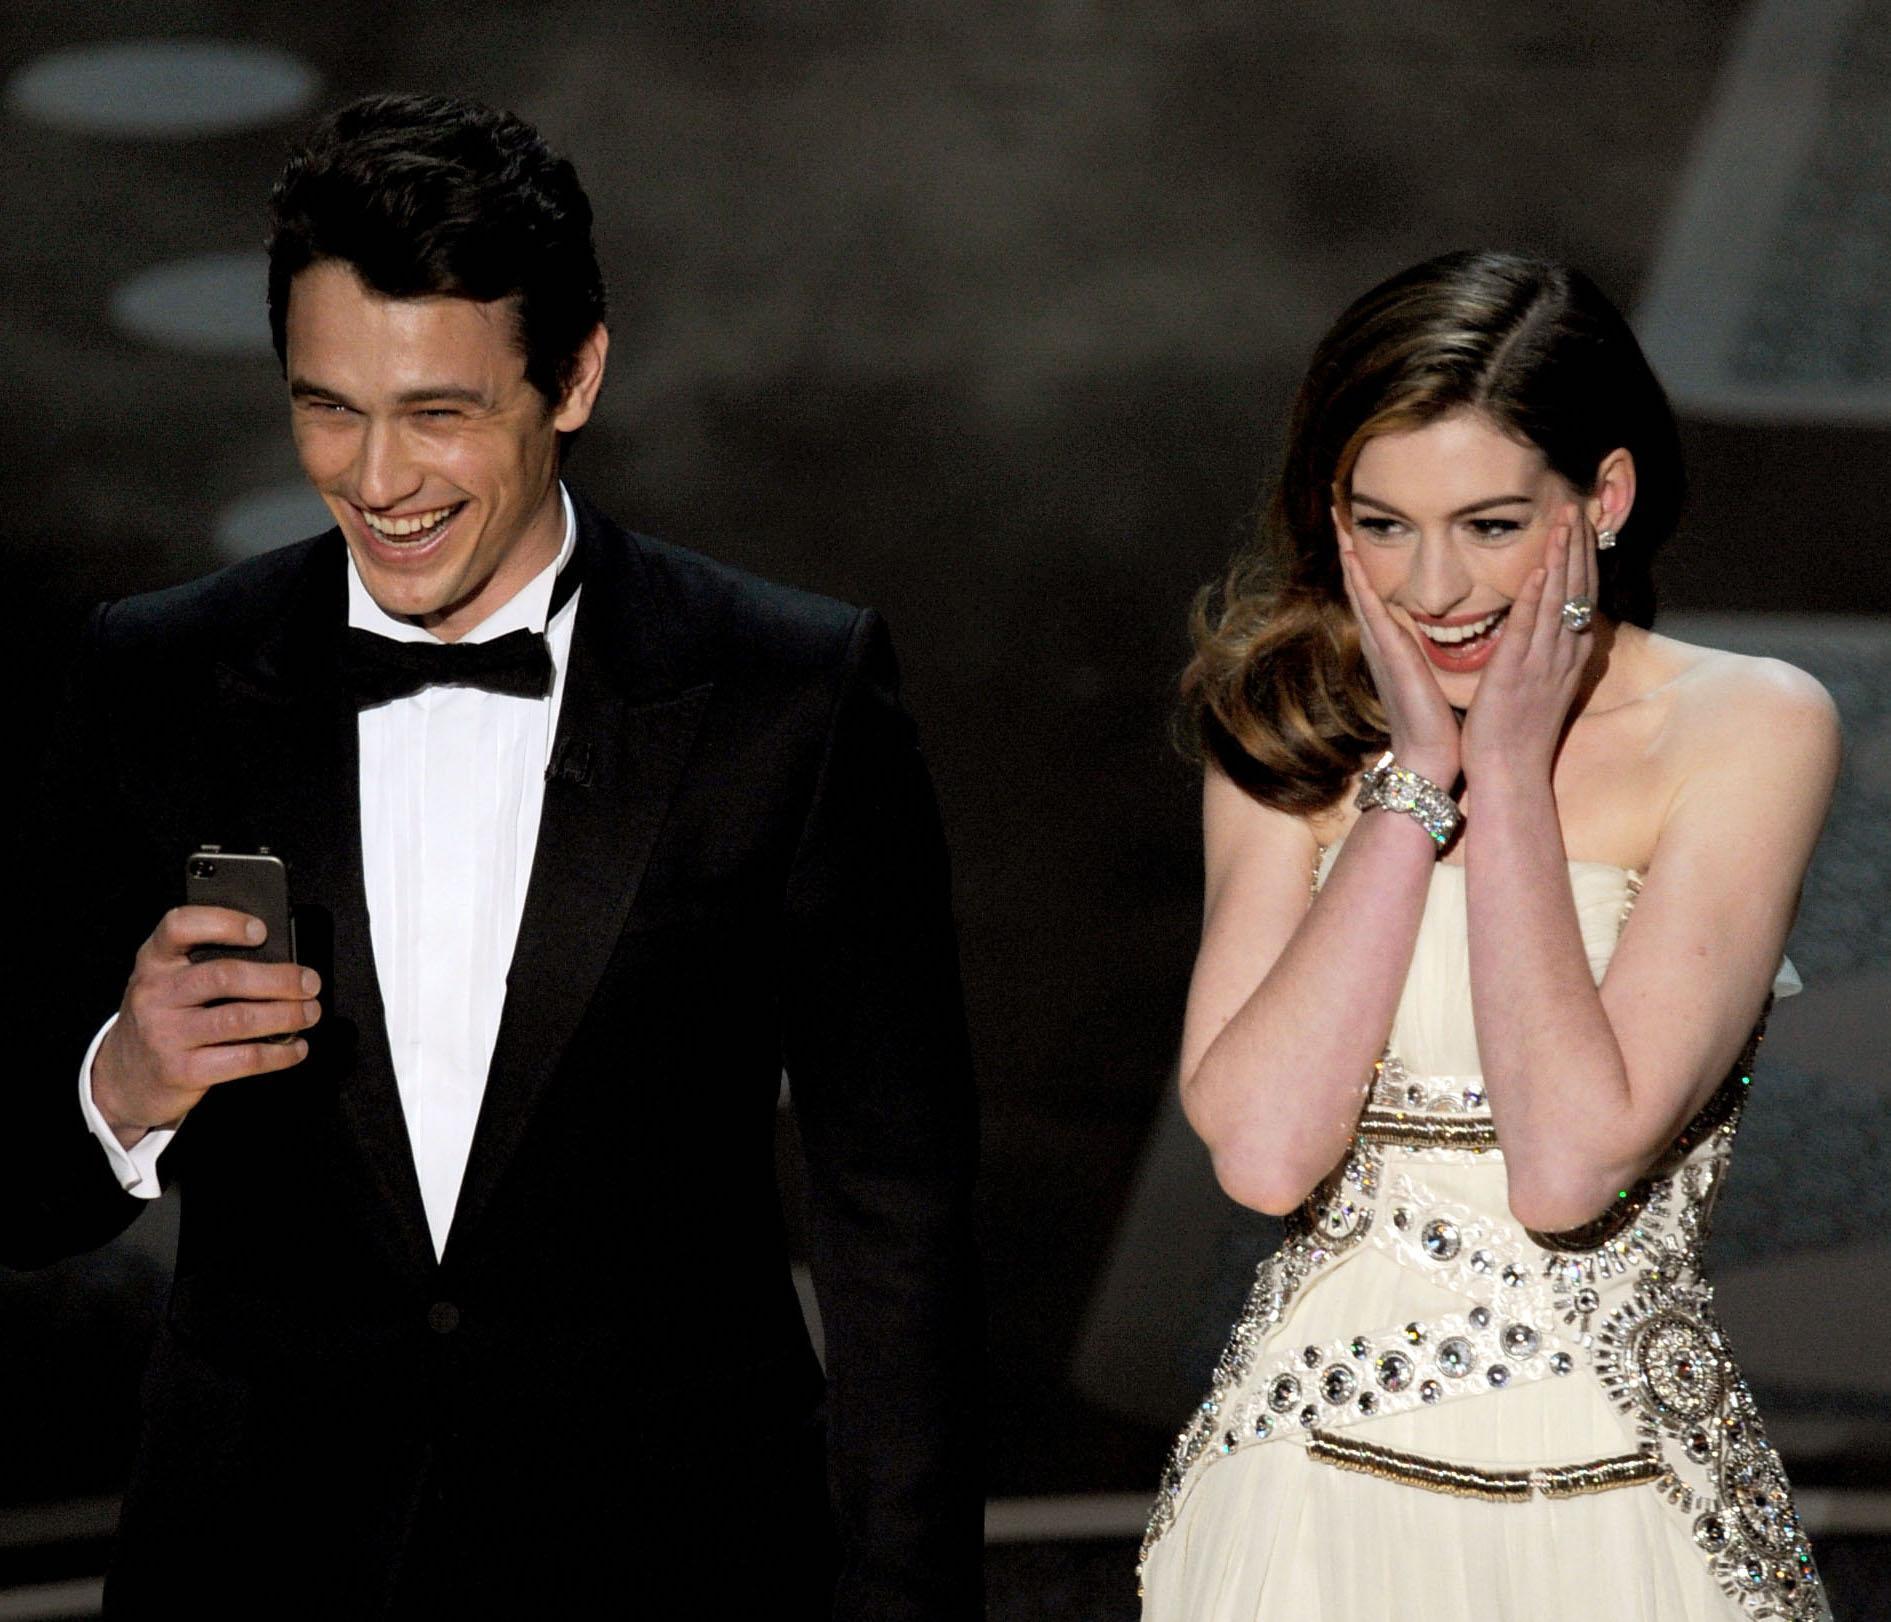 James Franco & Anne Hathaway